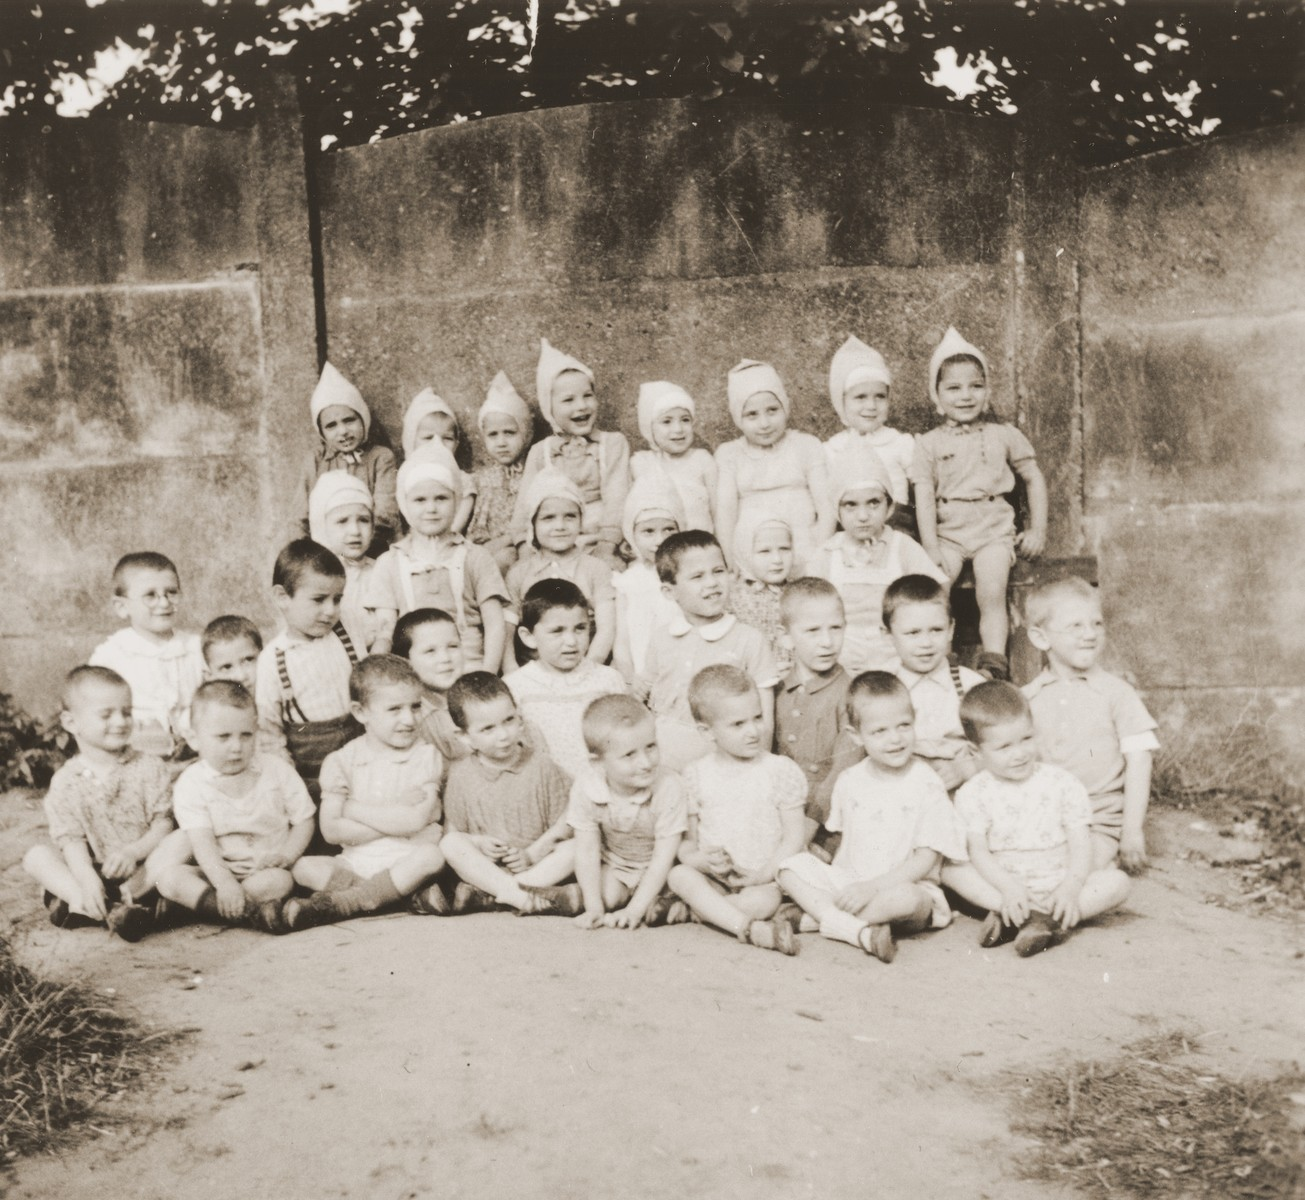 Group portrait of children at the La Pouponniere children's home in Belgium.